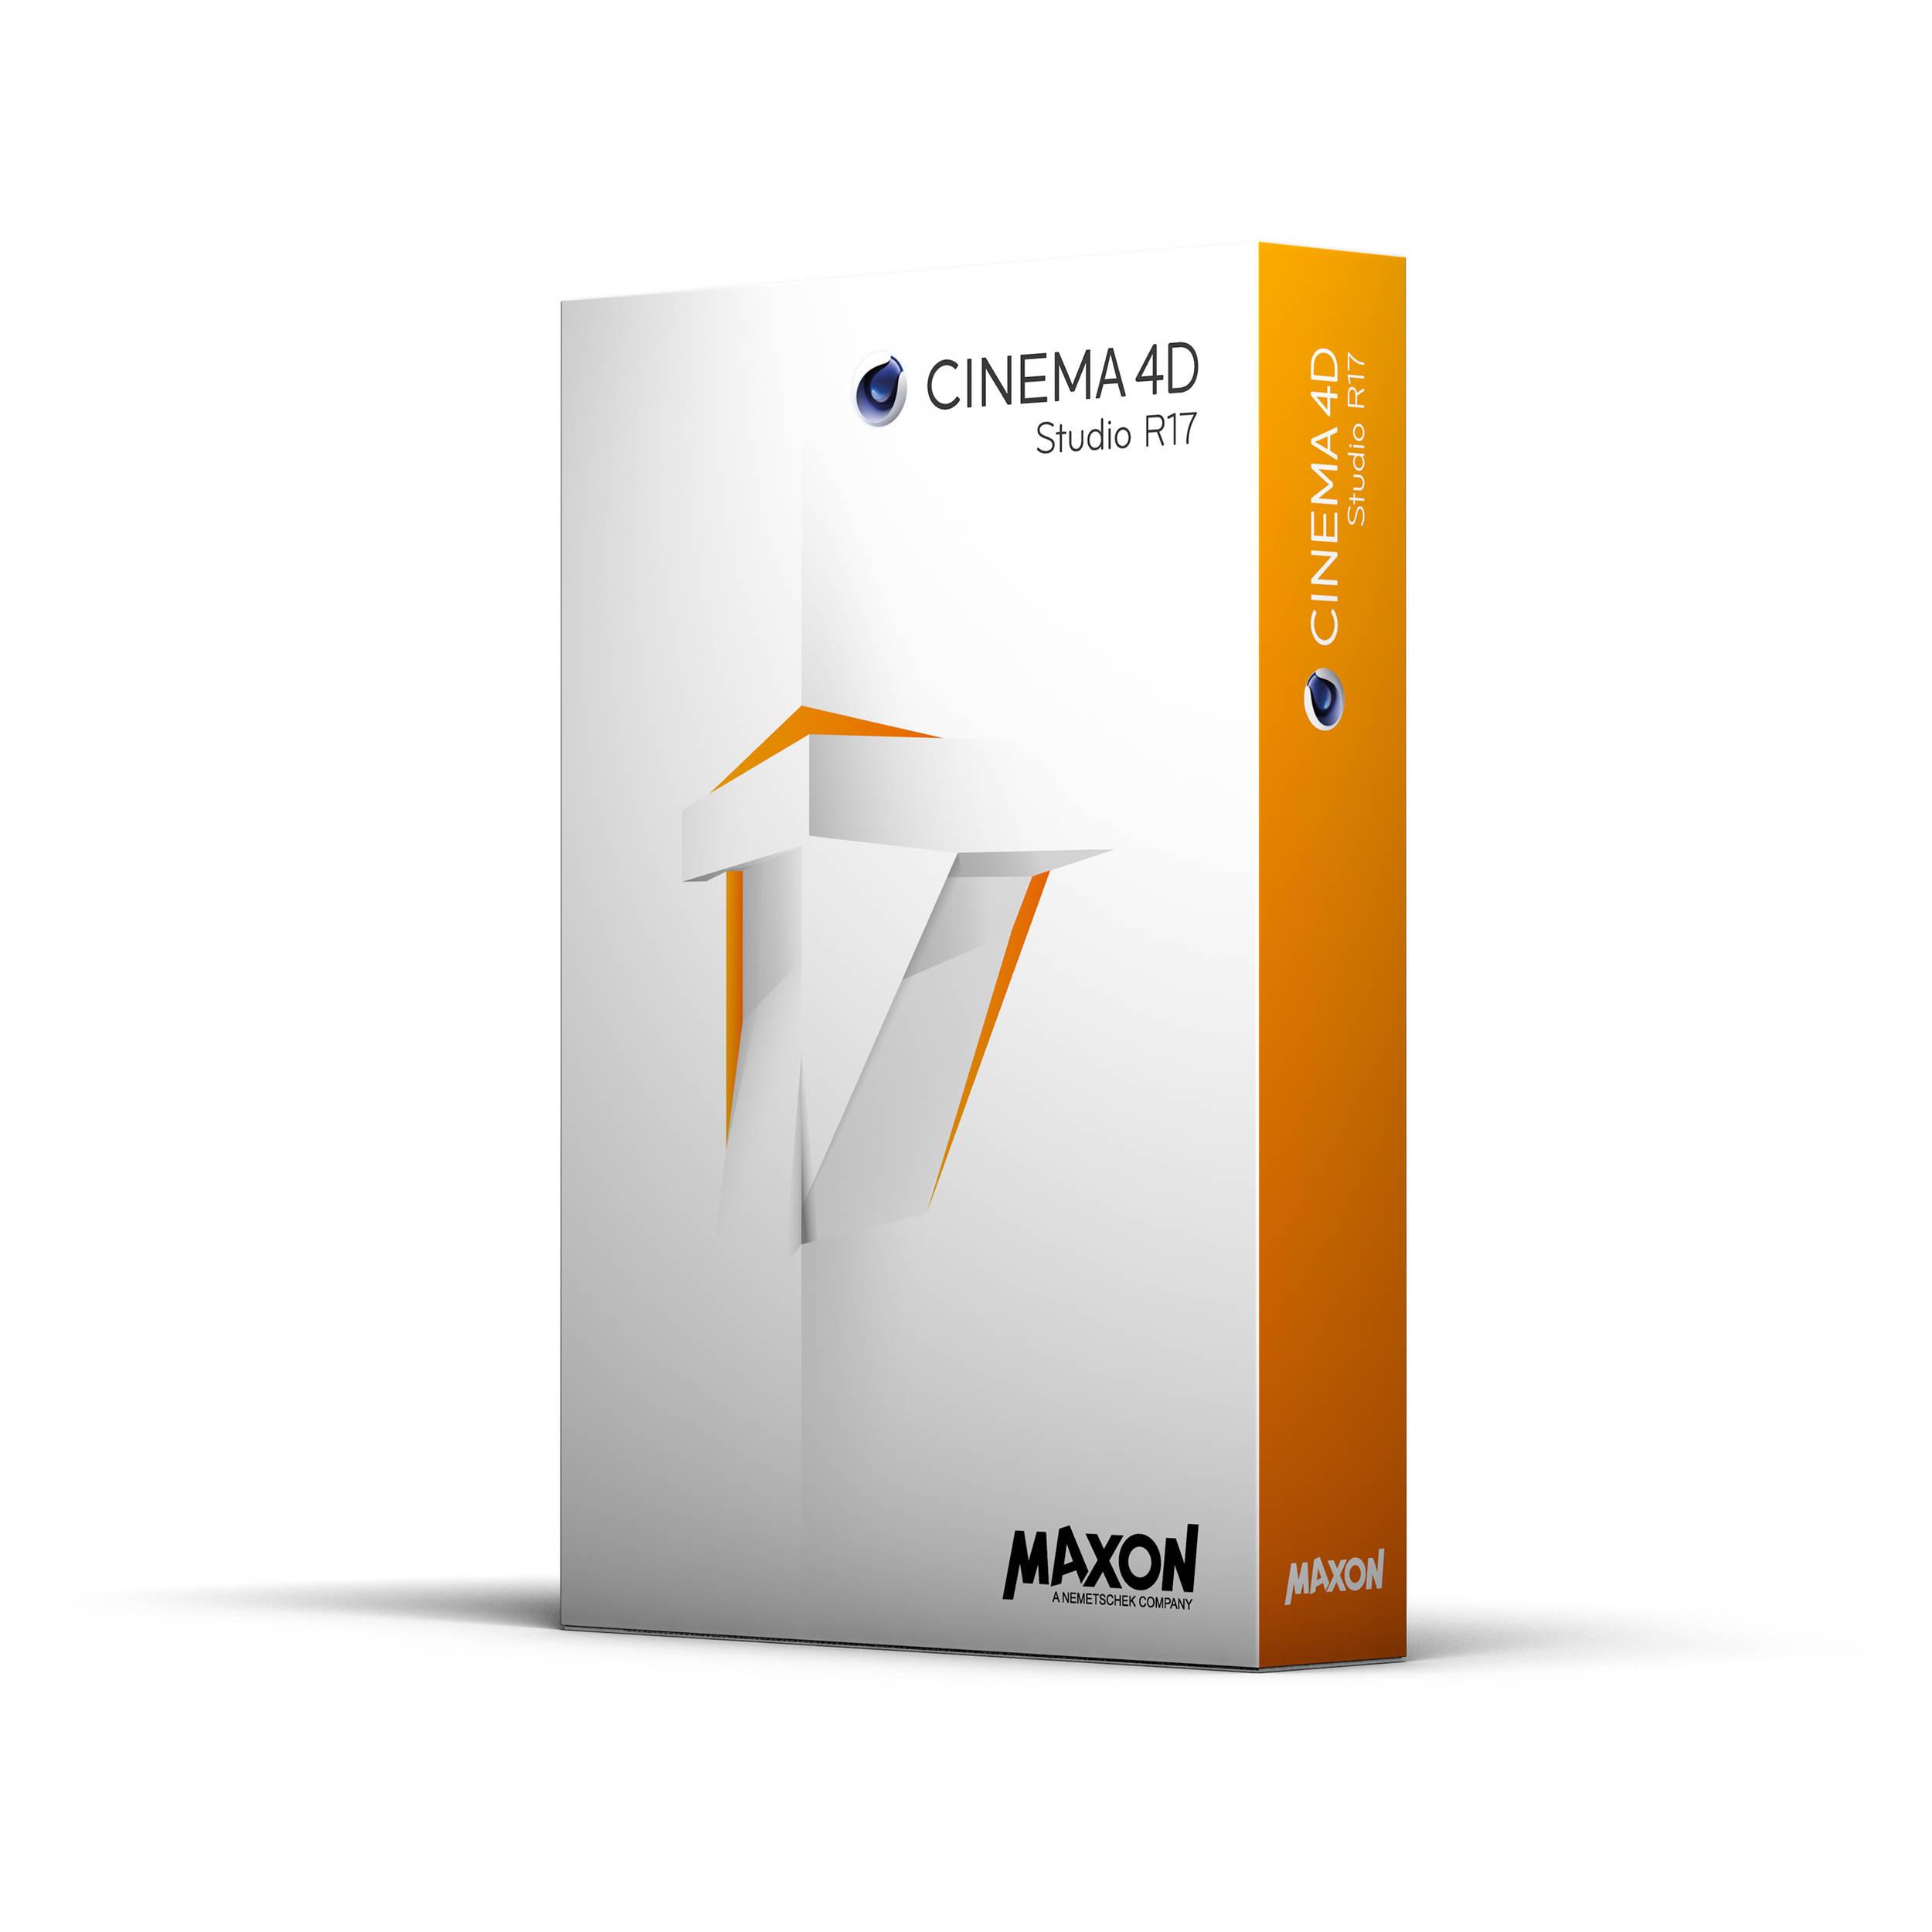 Vectric Vcarve Pro [HOT] Cracked Iphone maxon_c4dsb_n_lab17_cnm_4d_studio_r17_1187985